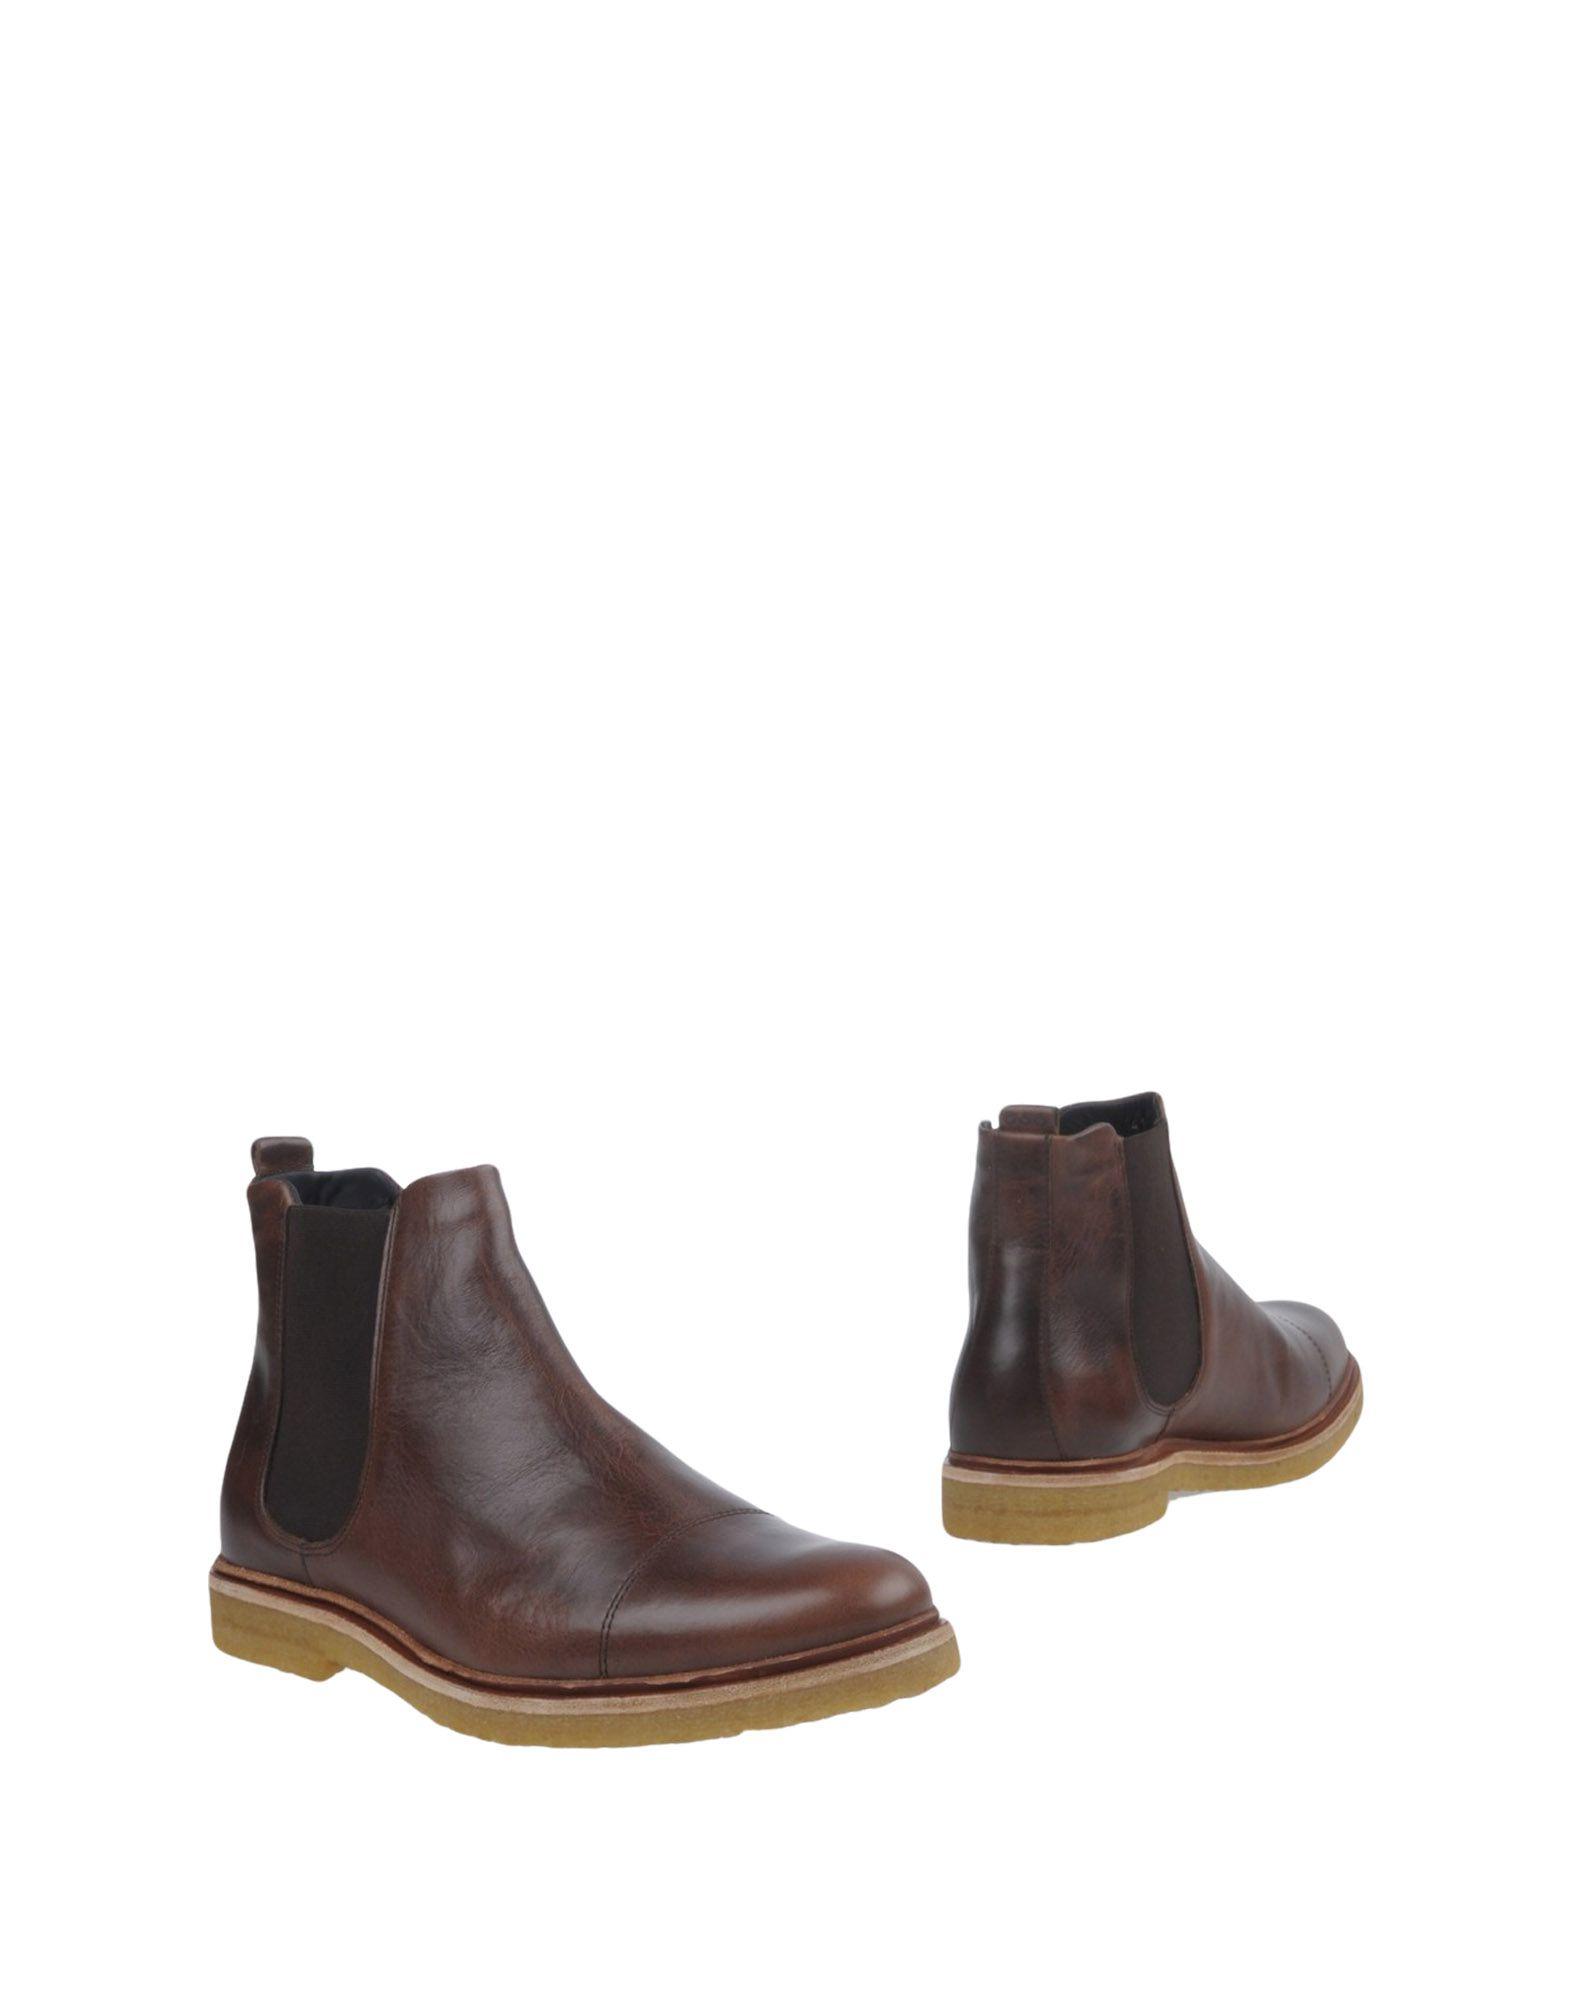 Rabatt echte Schuhe Royal Republiq Stiefelette Herren  11385134RB